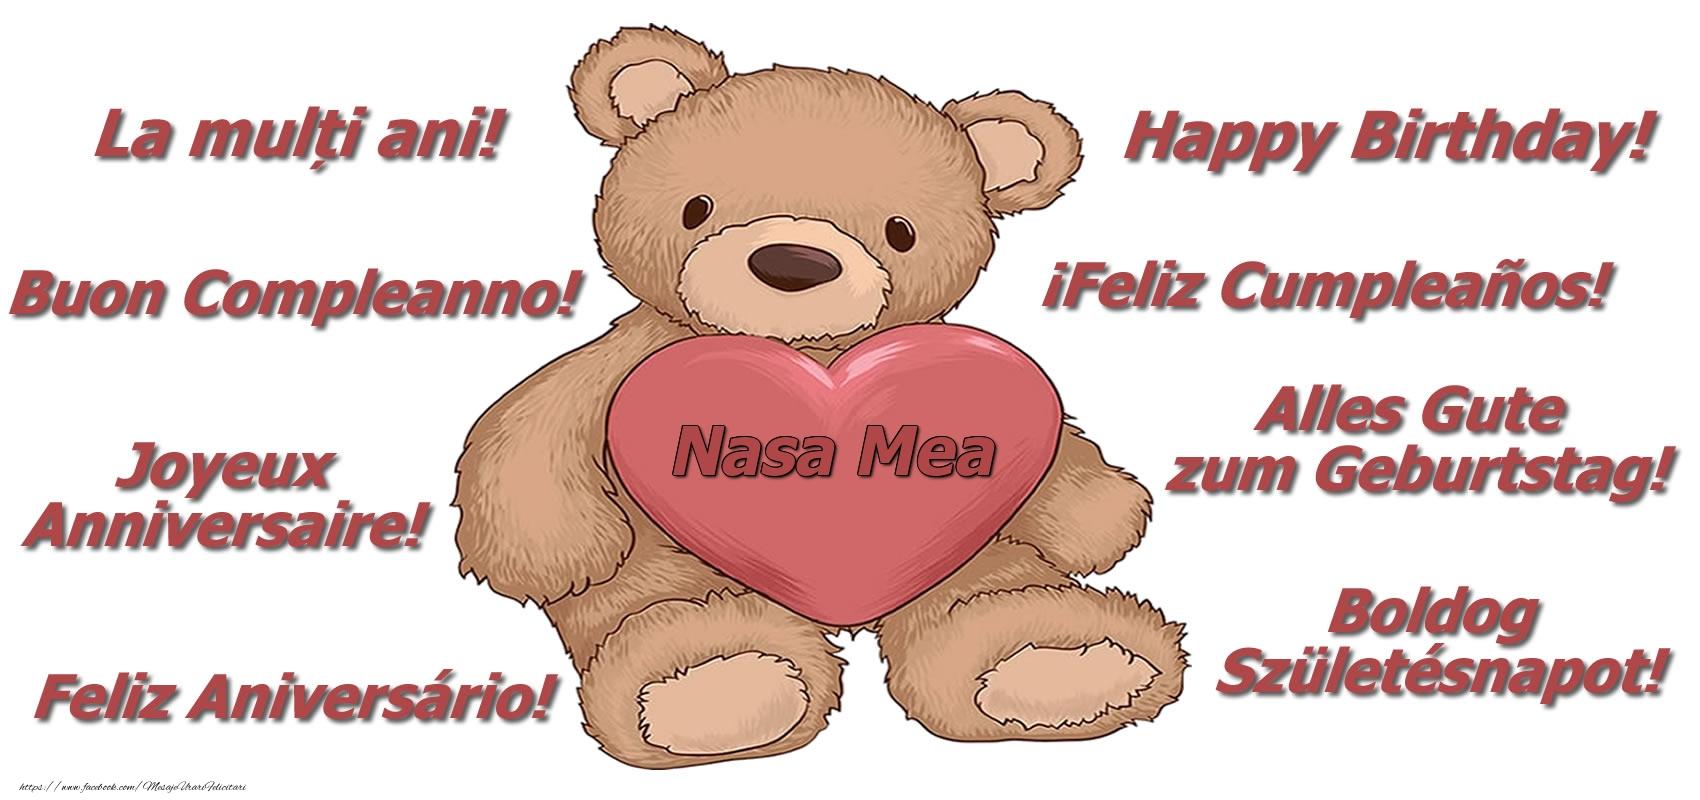 Felicitari de zi de nastere pentru Nasa - La multi ani nasa mea! - Ursulet